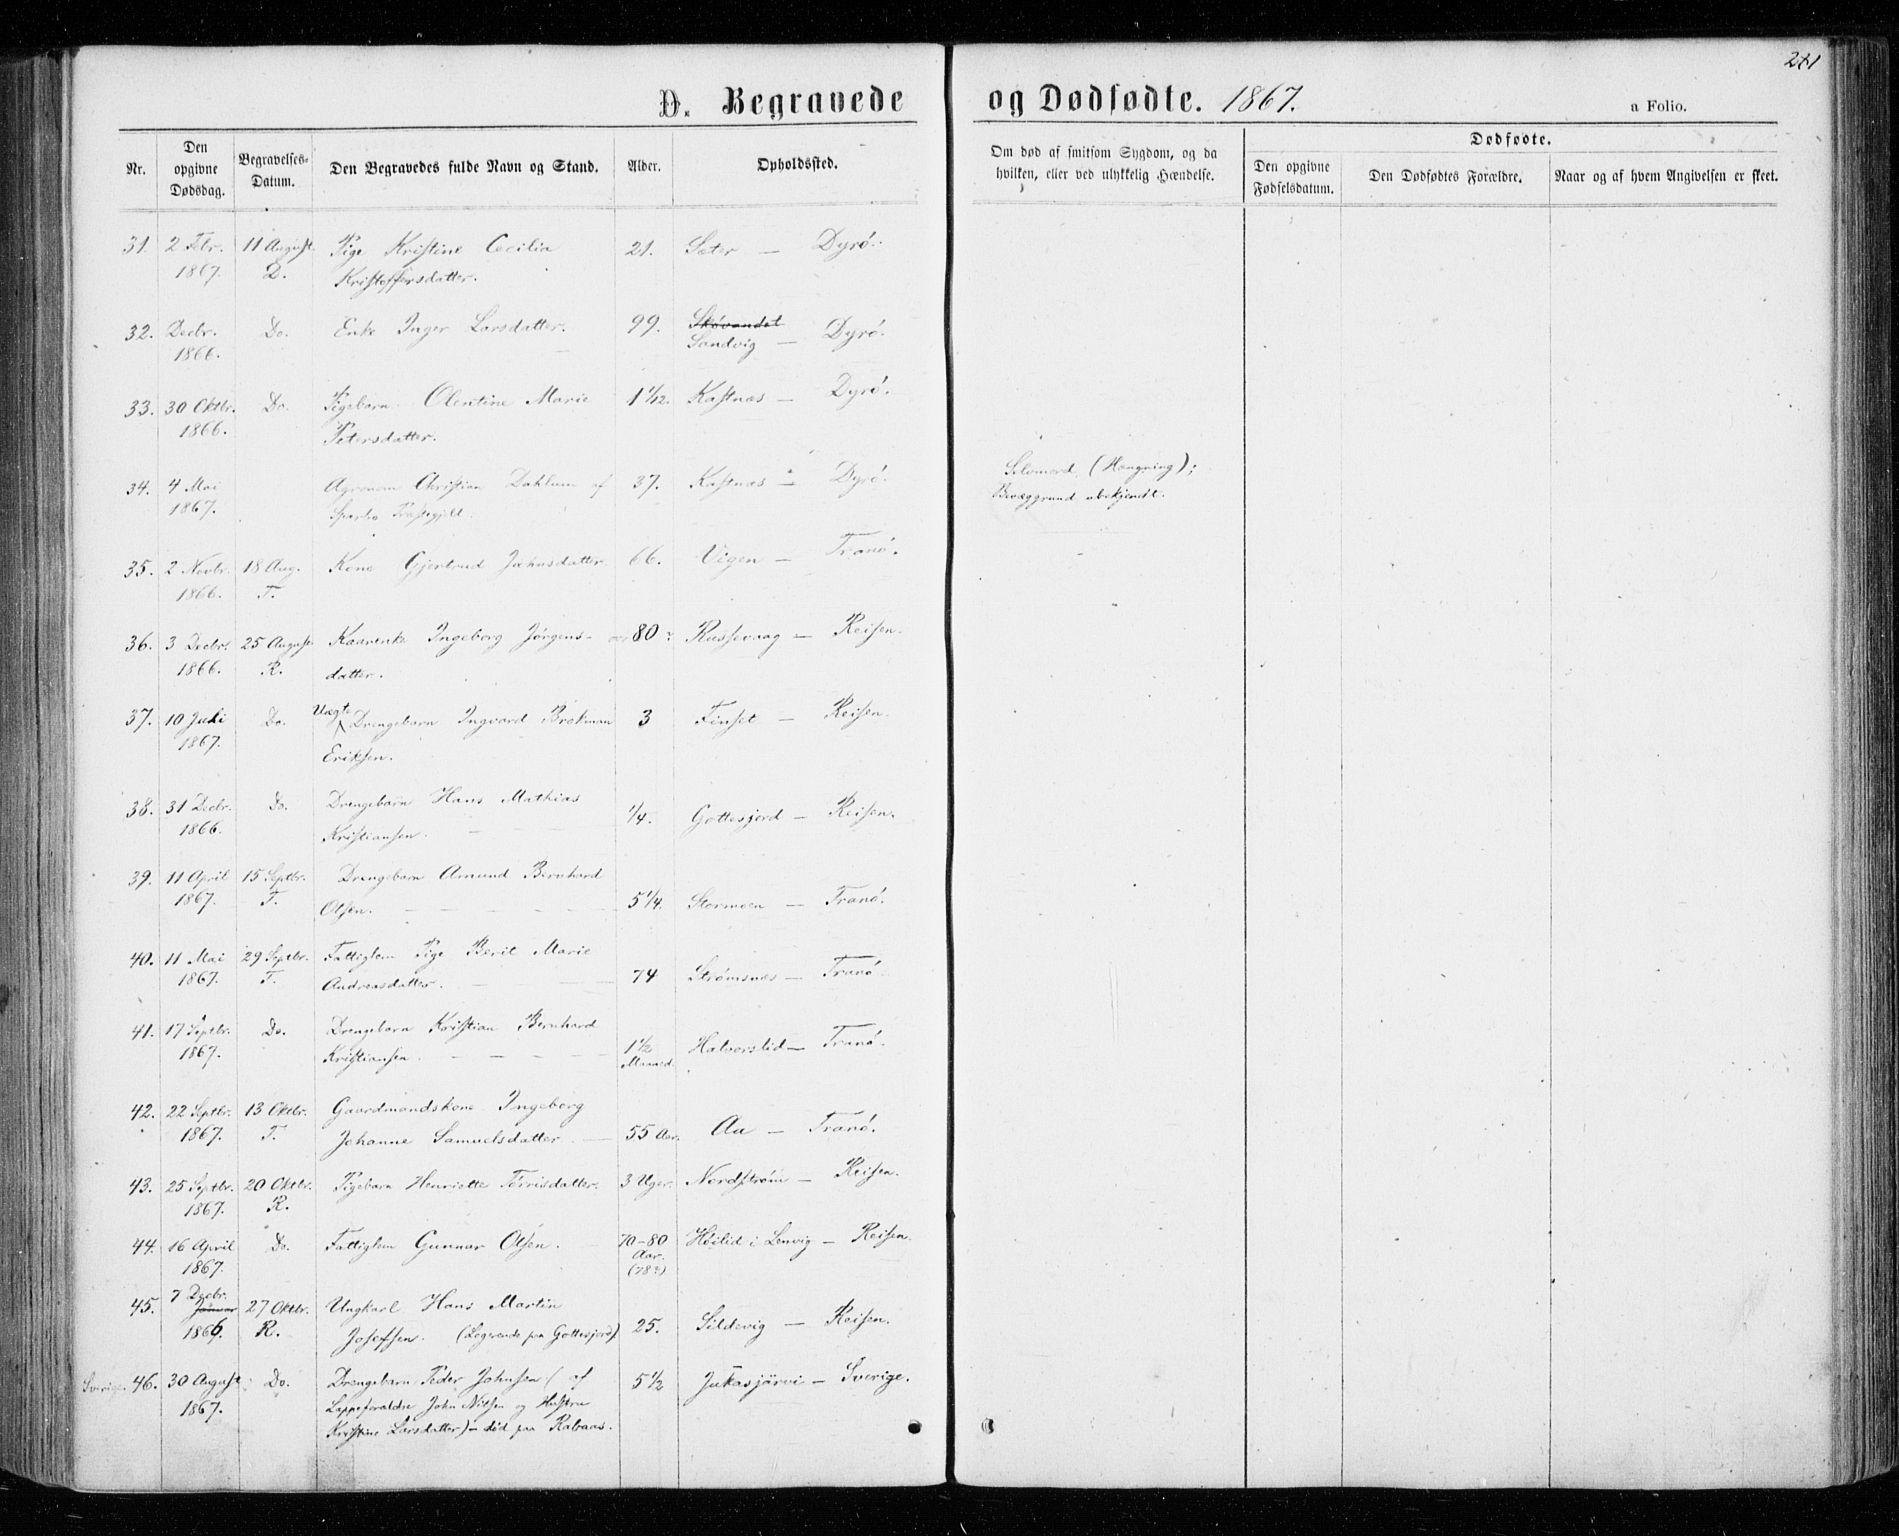 SATØ, Tranøy sokneprestkontor, I/Ia/Iaa/L0008kirke: Ministerialbok nr. 8, 1867-1877, s. 281